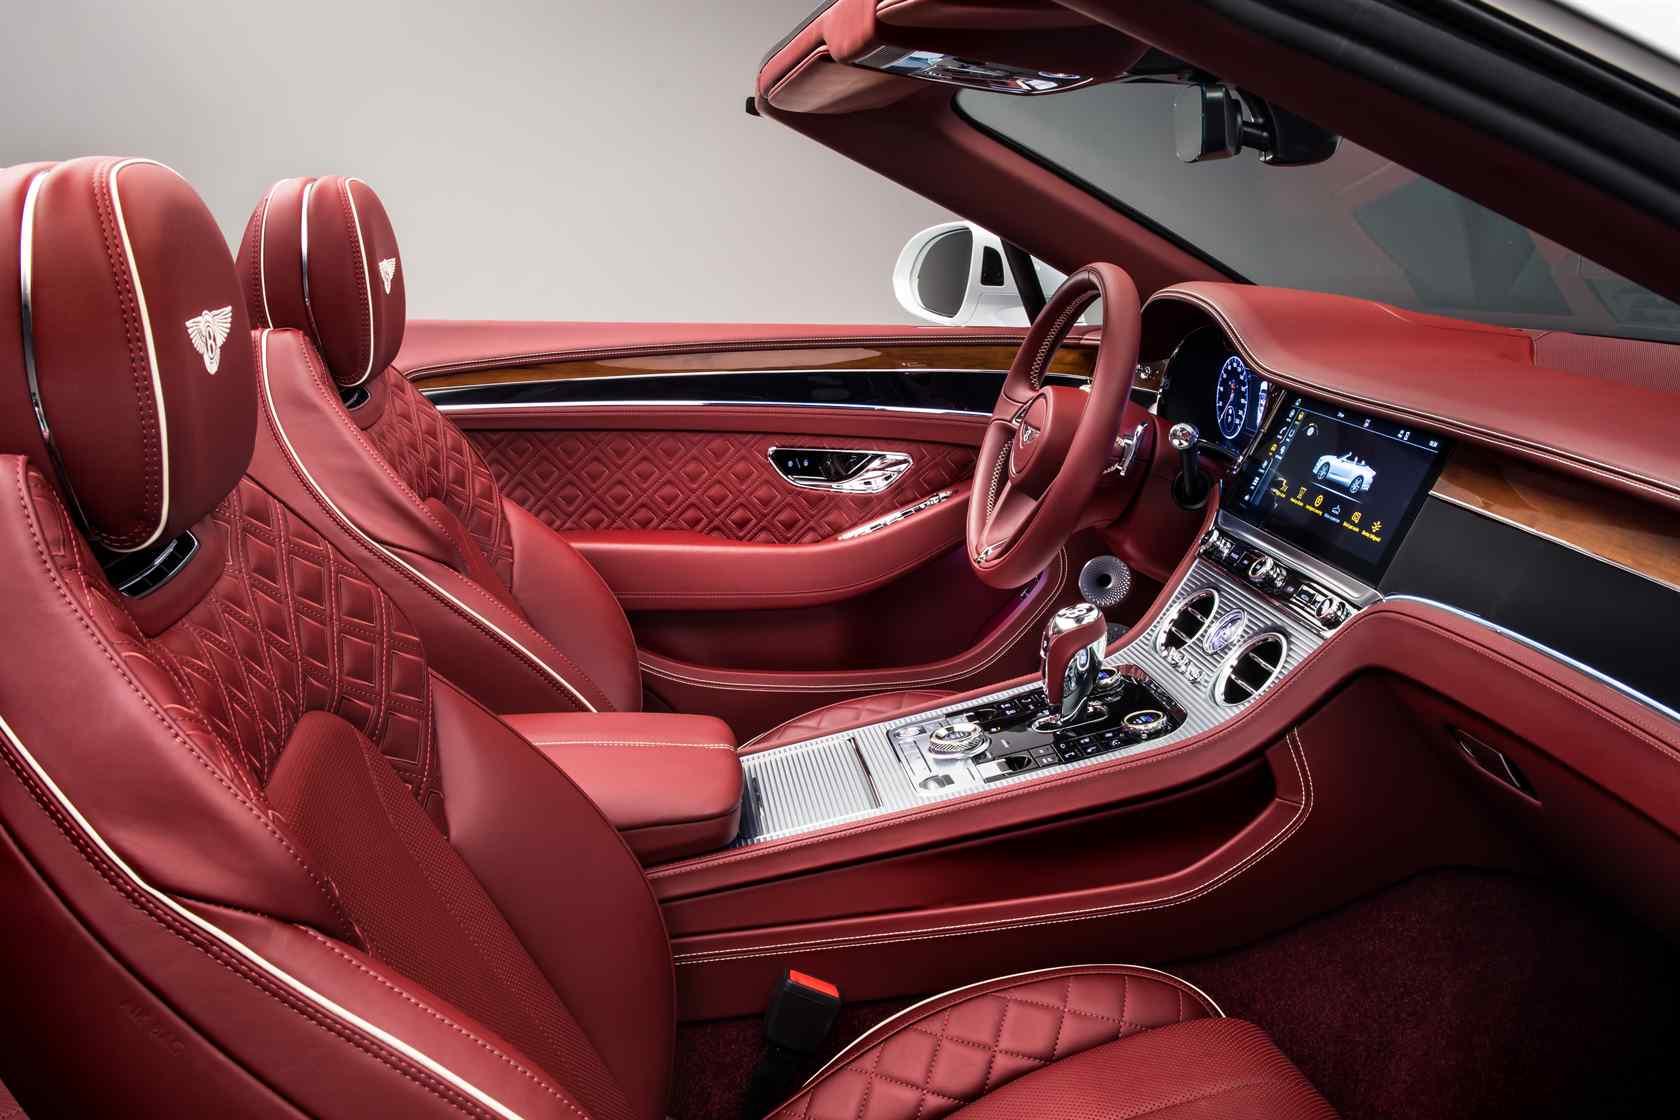 2019 Bentley Continental Gt Convertible First Drive Review Droptop Drama Slashgear